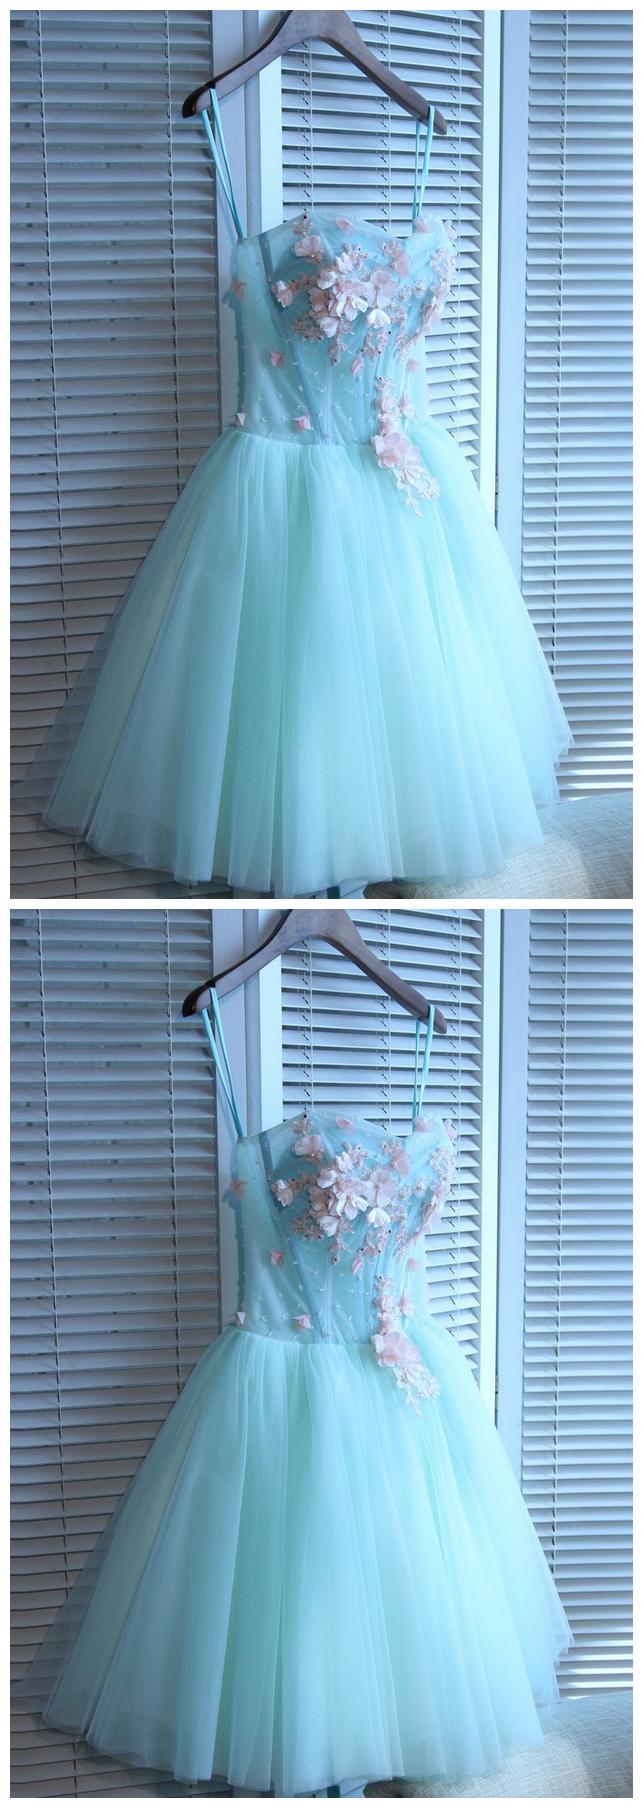 Aline homecoming dress shortmini prom dress juniors homecoming